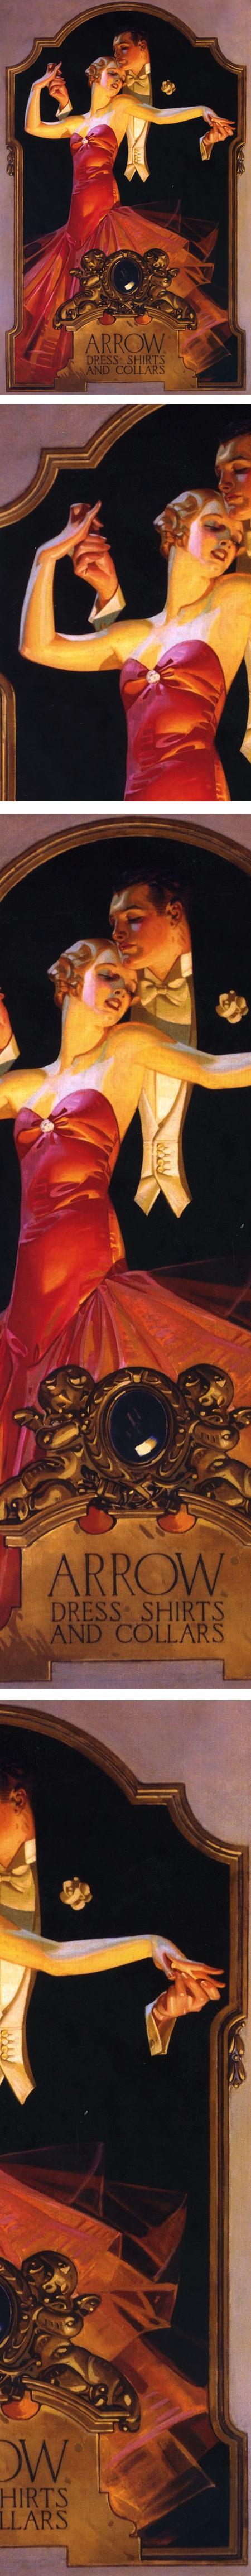 Illustration for Arrow Shirt advertisement, JC Leyendecker